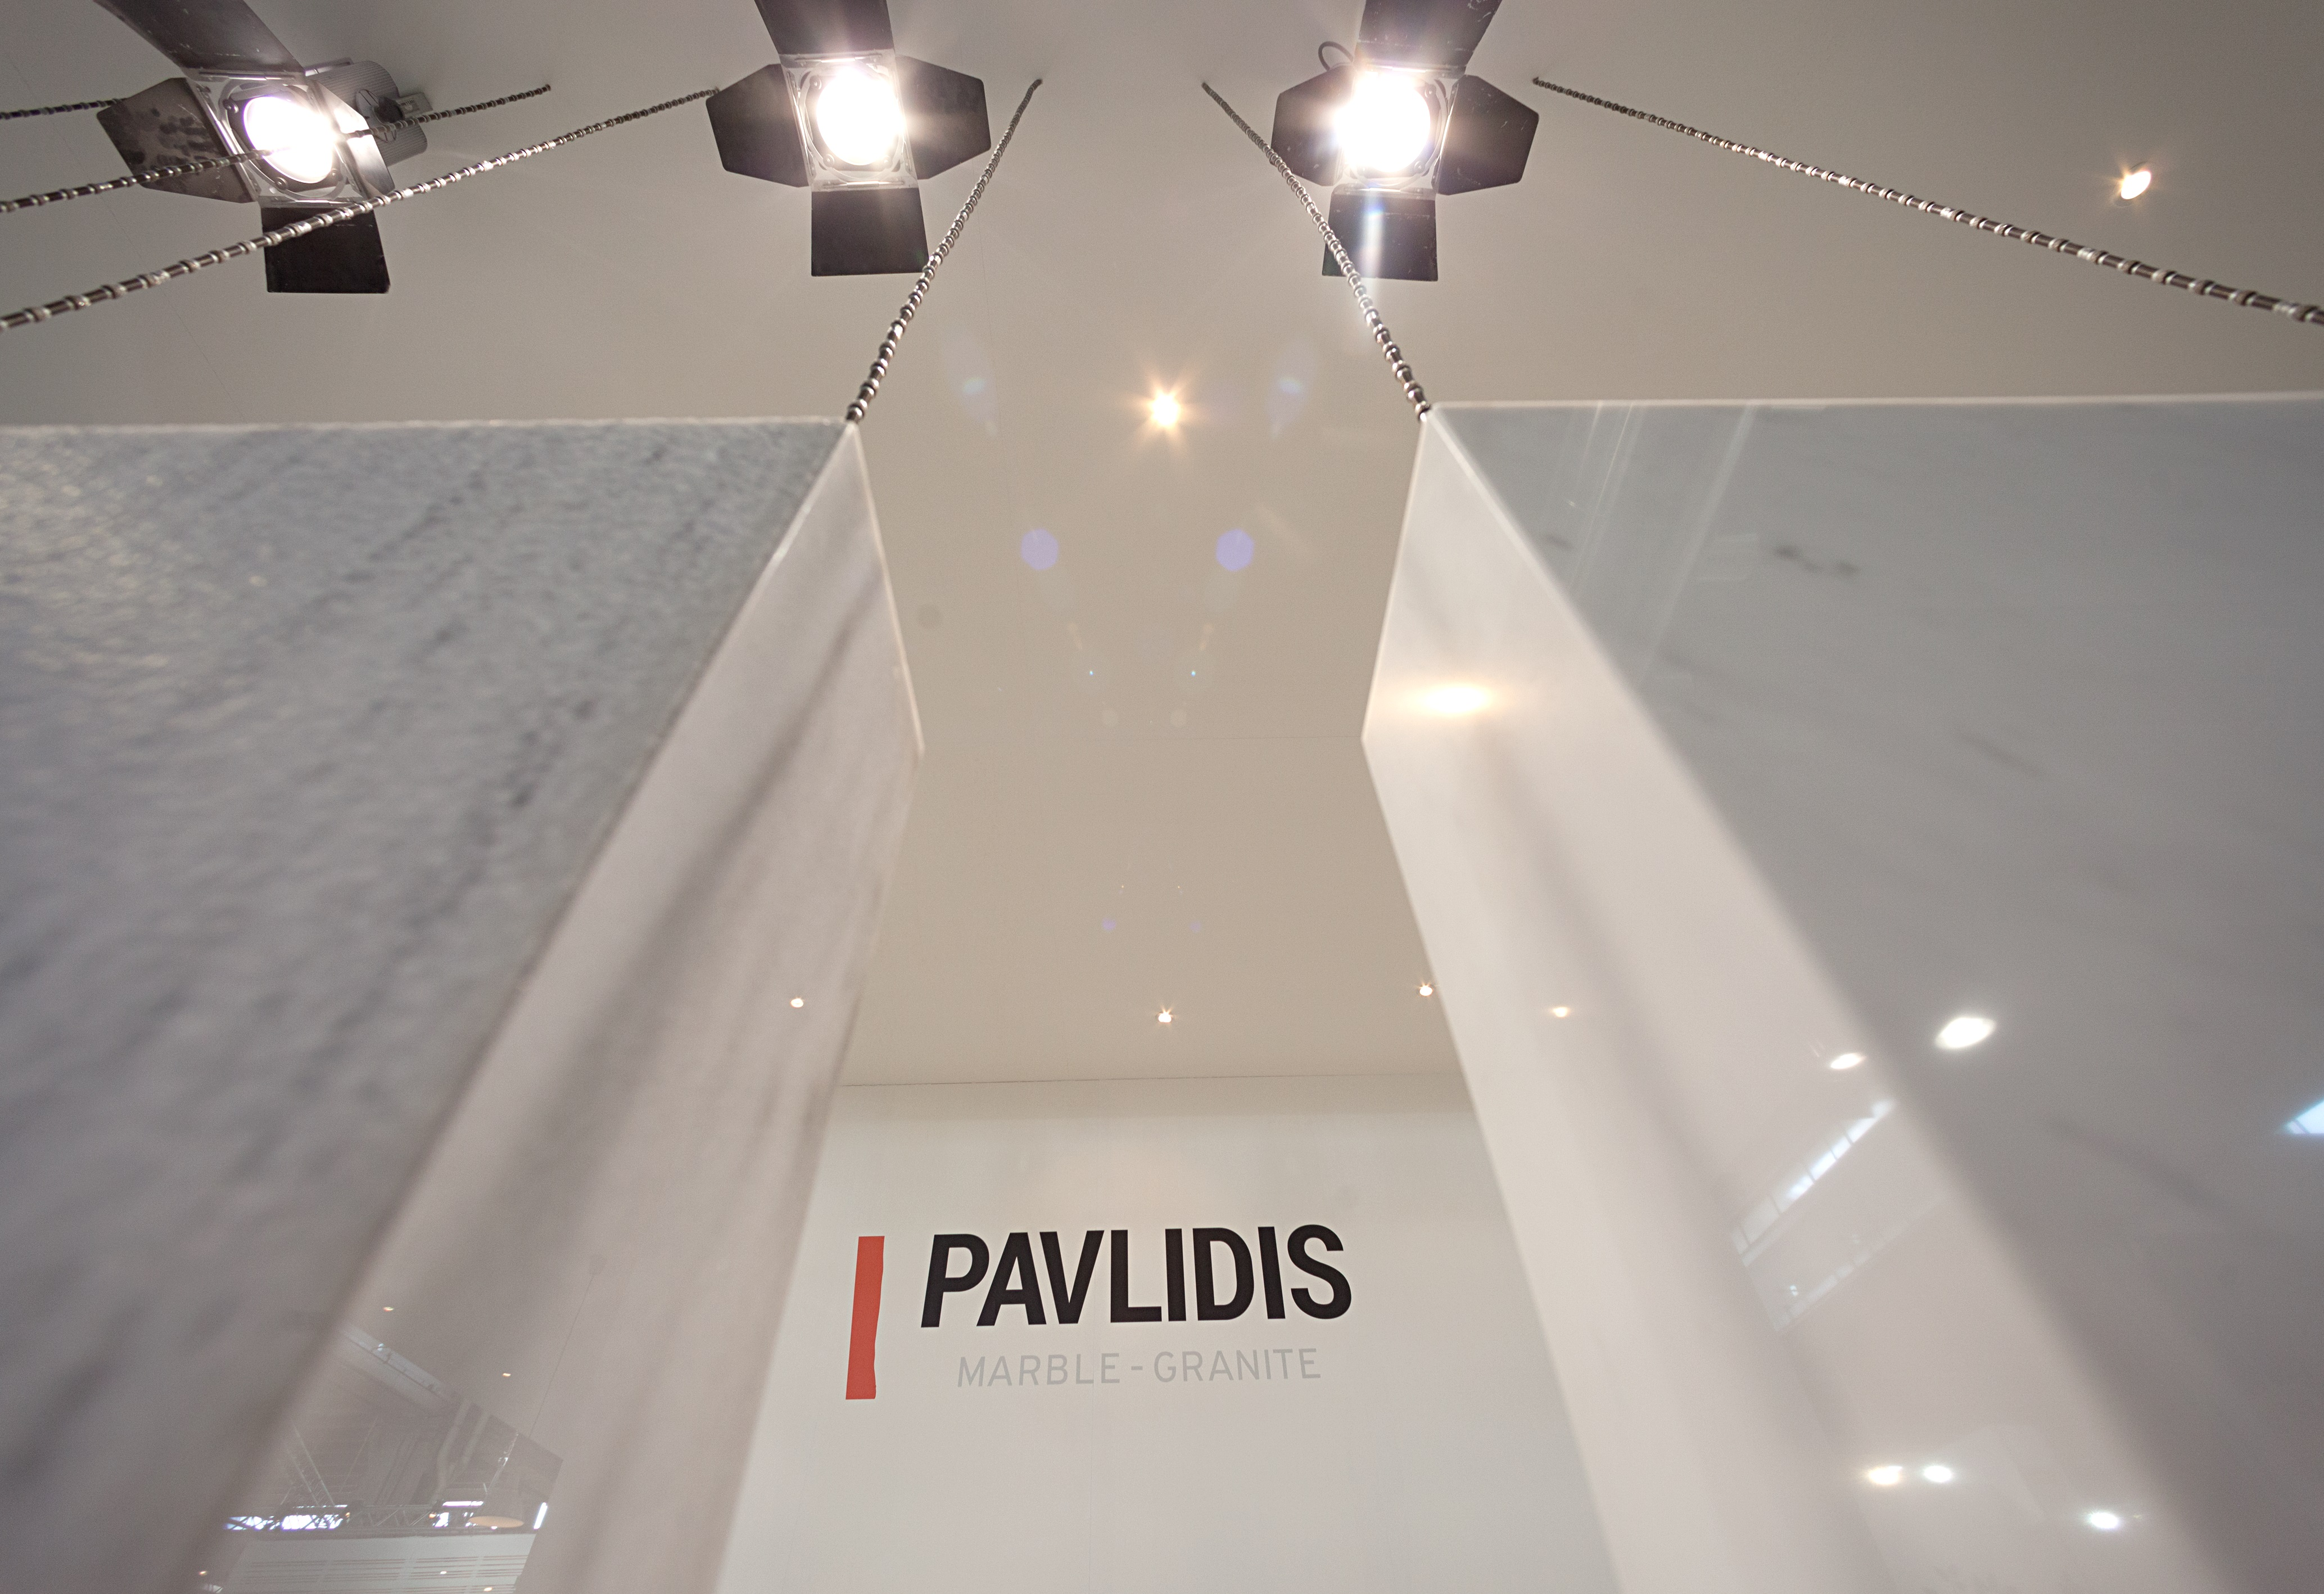 PAVLIDIS stand